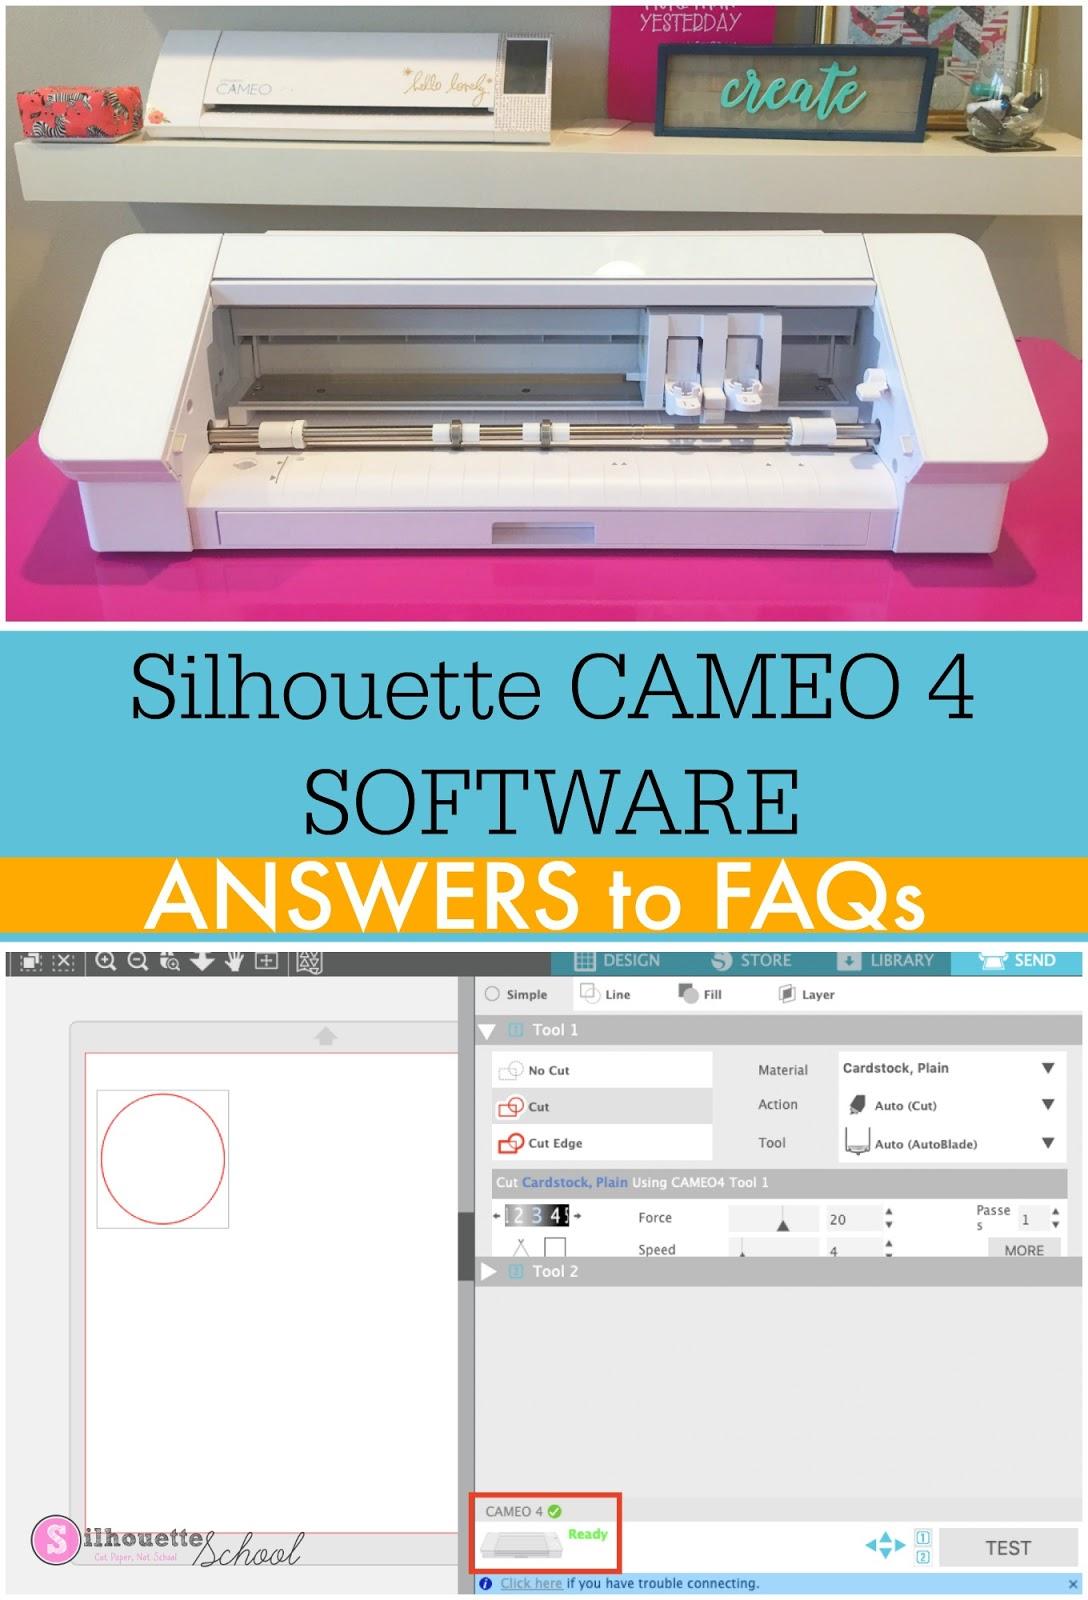 silhouette 101, silhouette america blog, cameo 4, silhouette studio, silhouette cameo 4